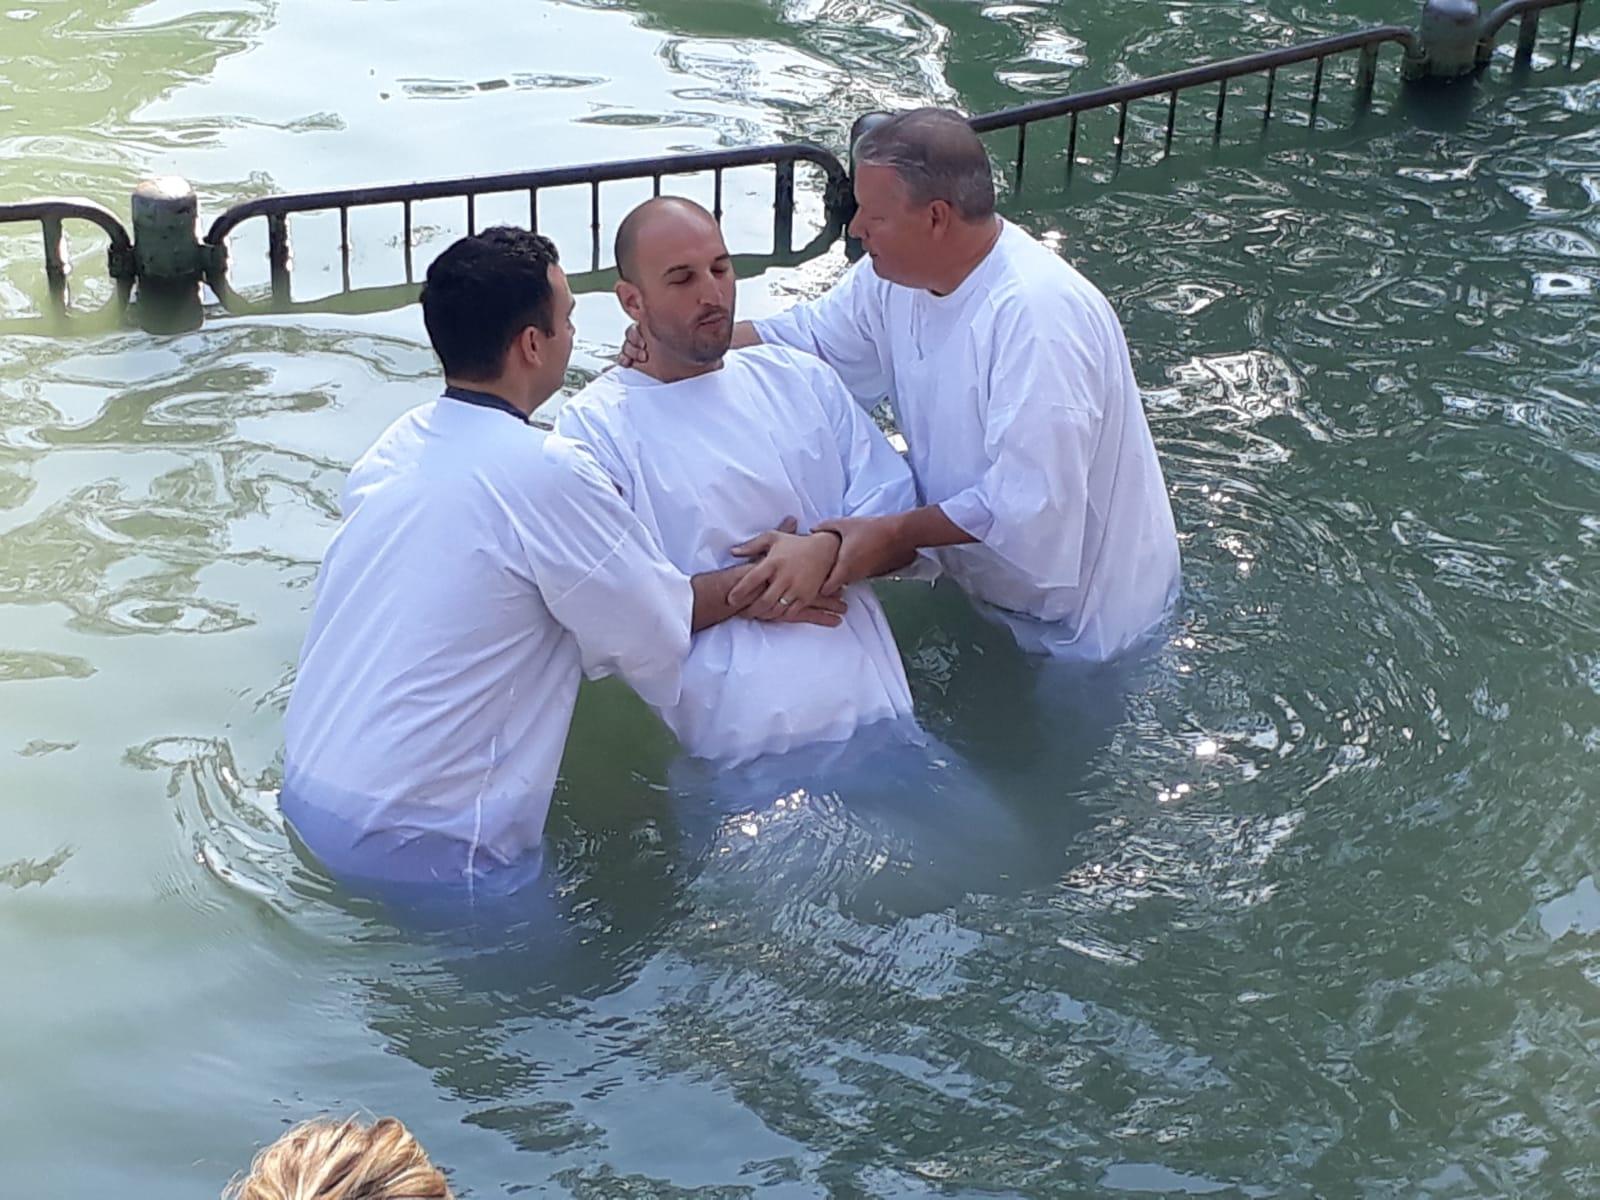 Jordan River baptism christian tour - friendshiptours.com